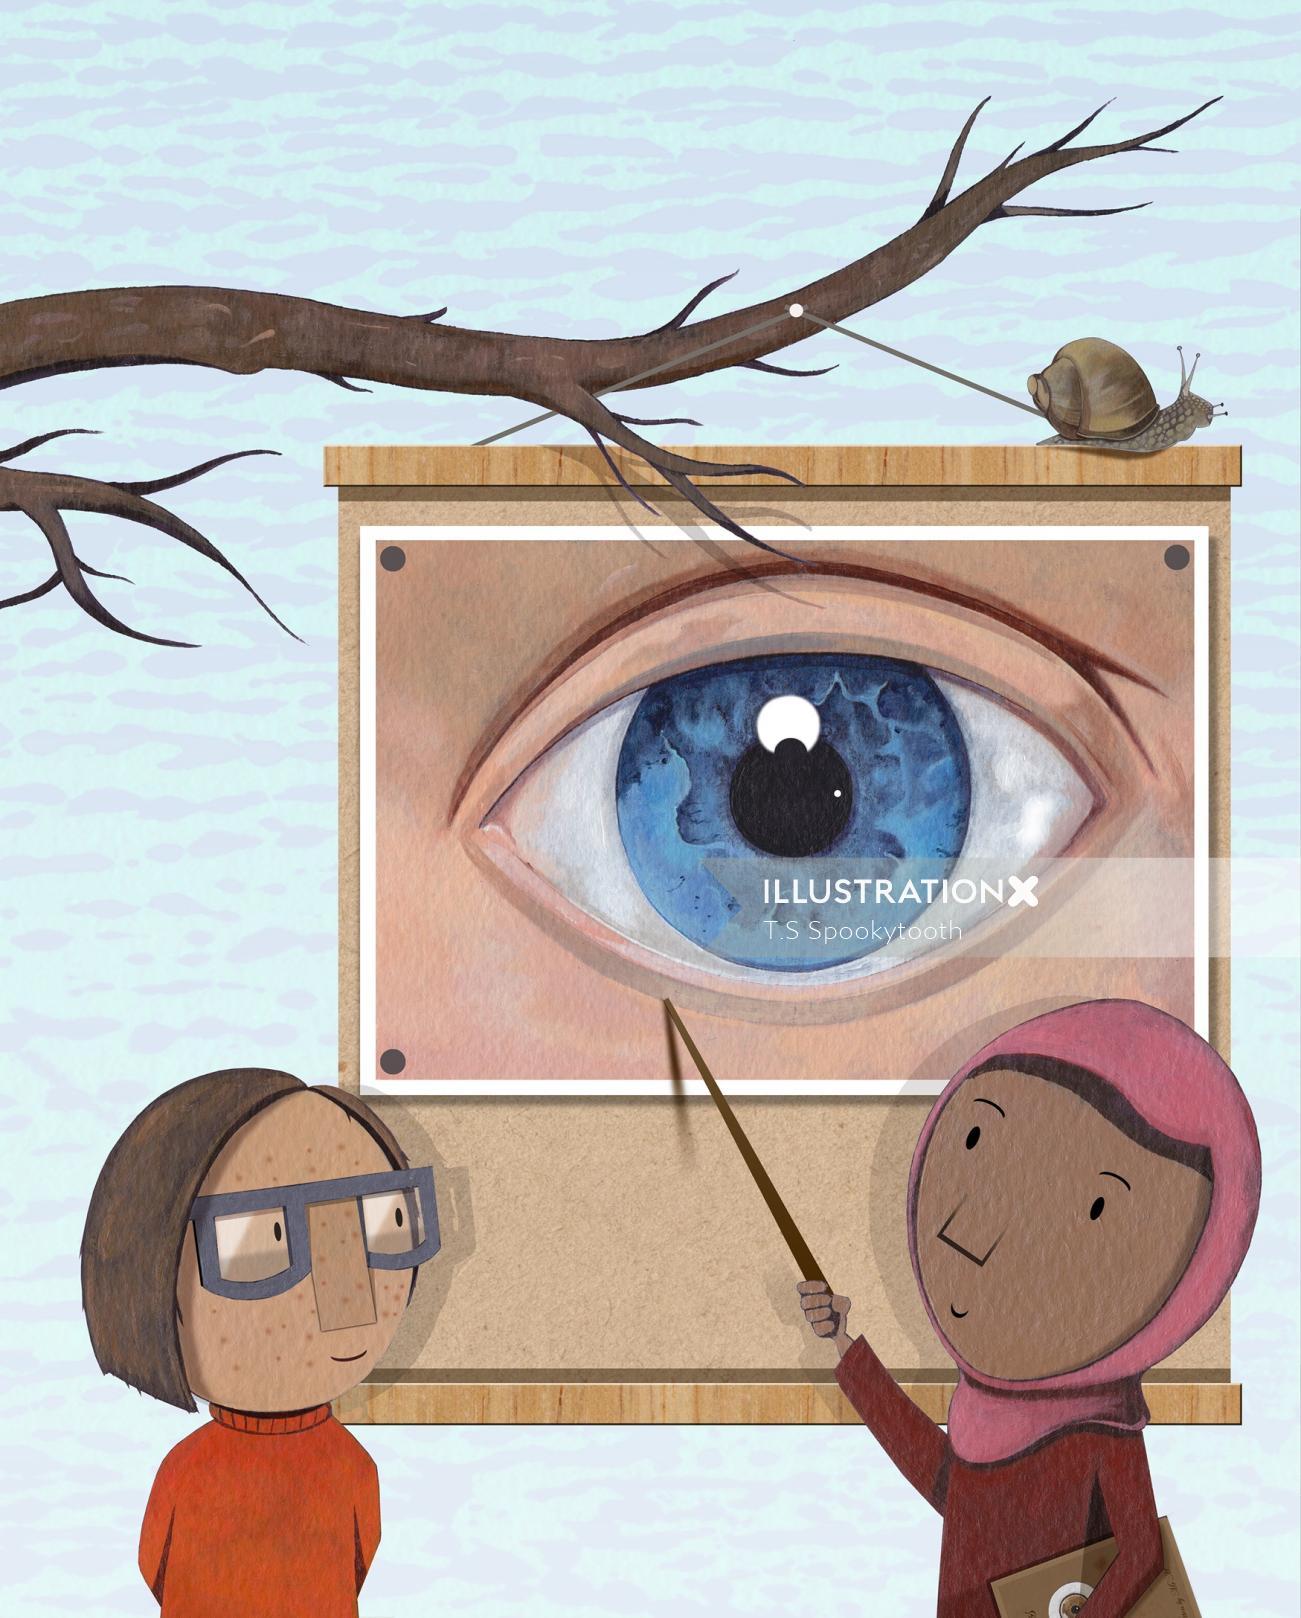 Children Interior spread for Eye by Eye.